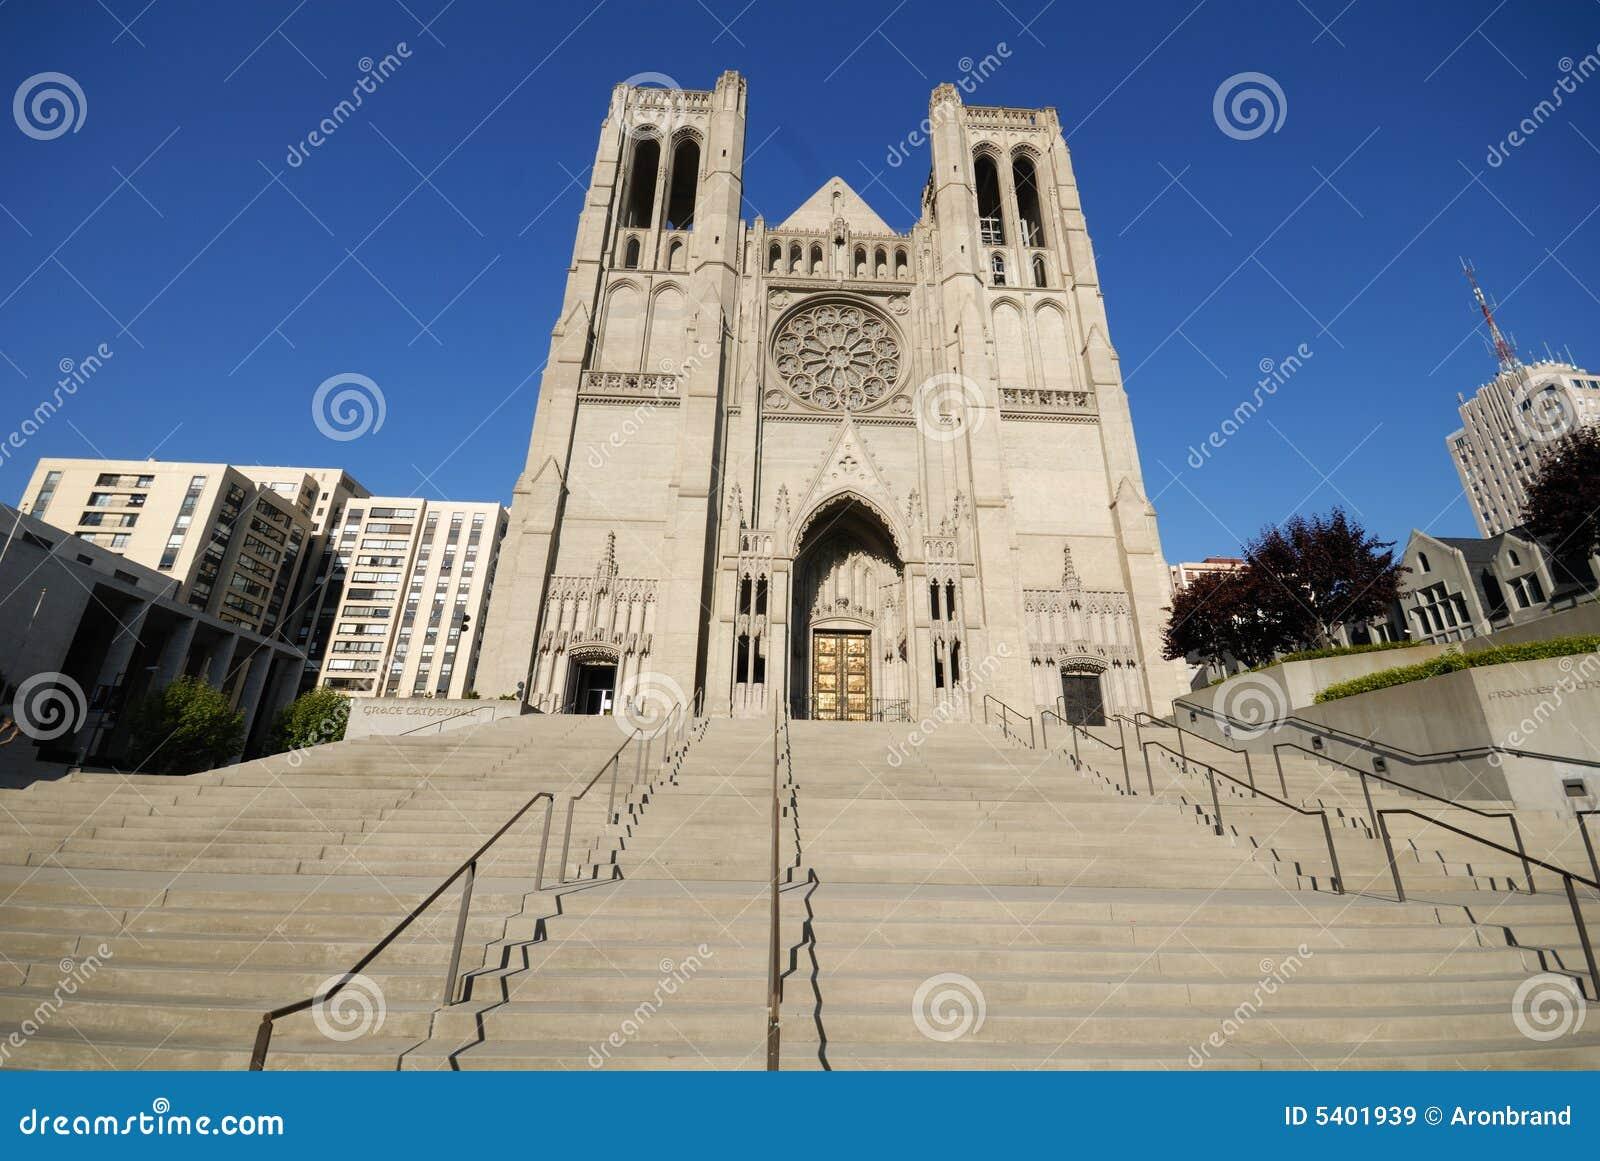 De Kathedraal van de gunst - San Francisco